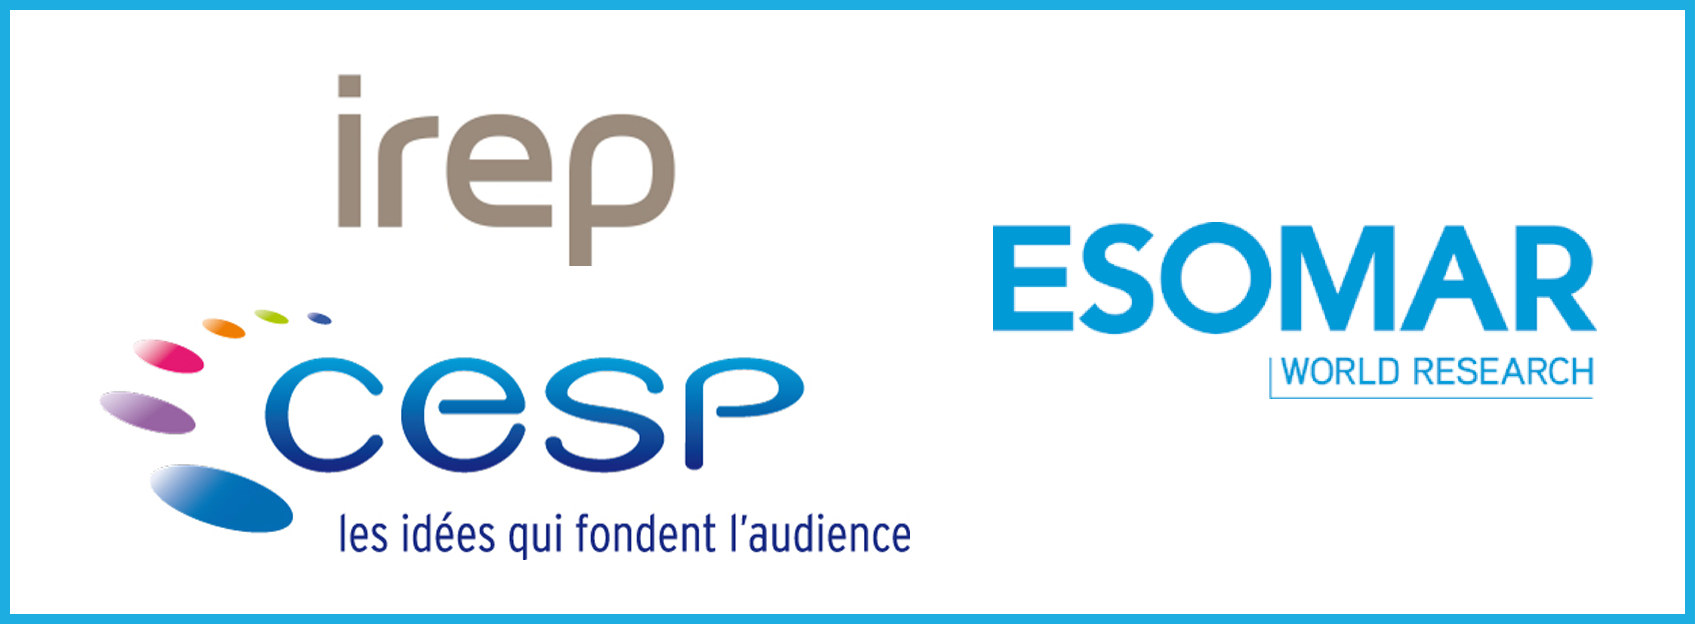 IREP-CESP / ESOMAR : jeudi et vendredi, respondi est de sortie